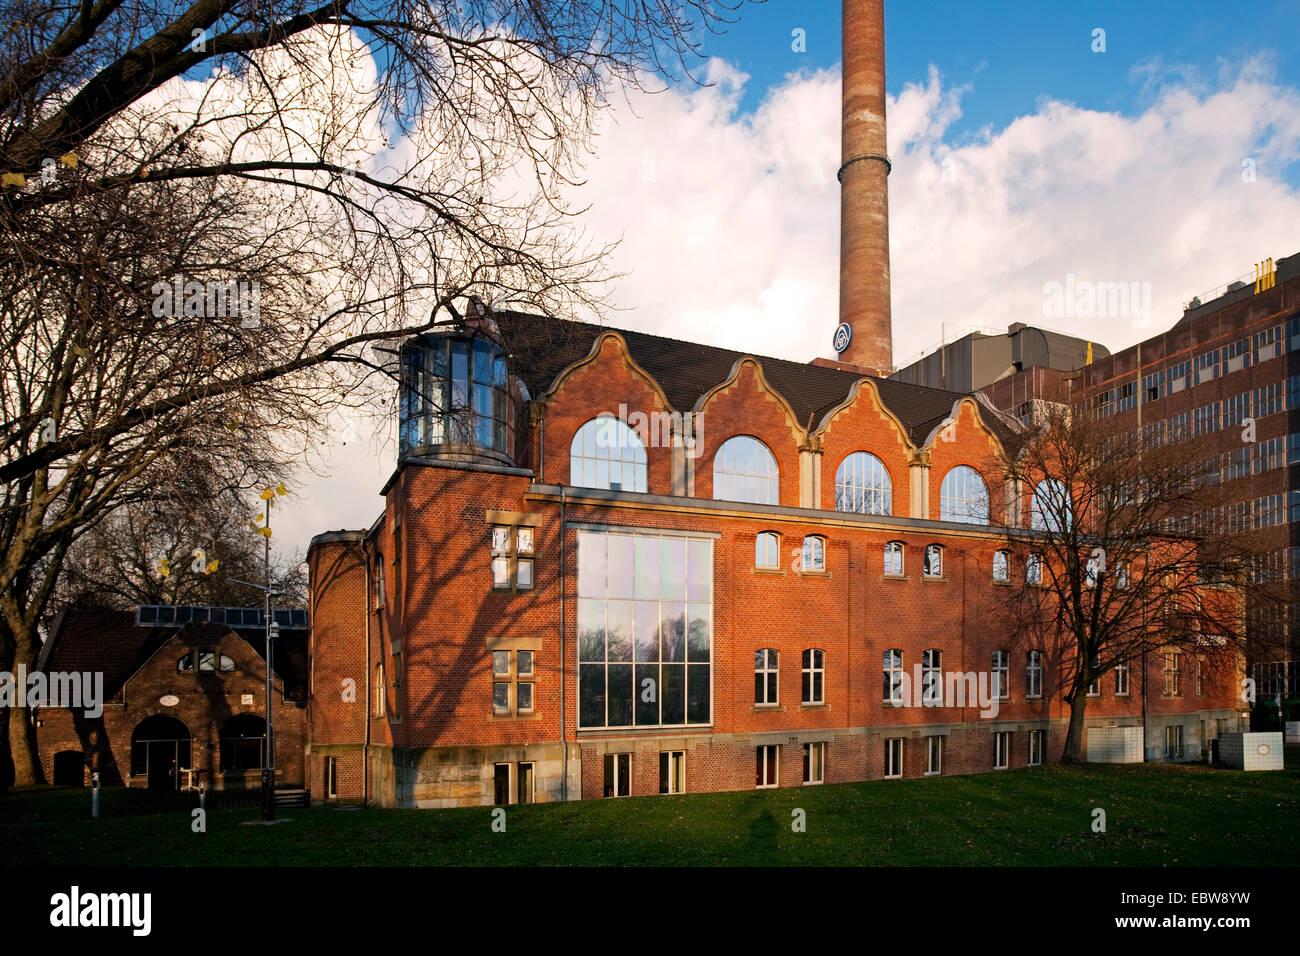 art nouveau facade of German Inland Waterways Museum, Germany, North Rhine-Westphalia, Ruhr Area, Duisburg - Stock Image